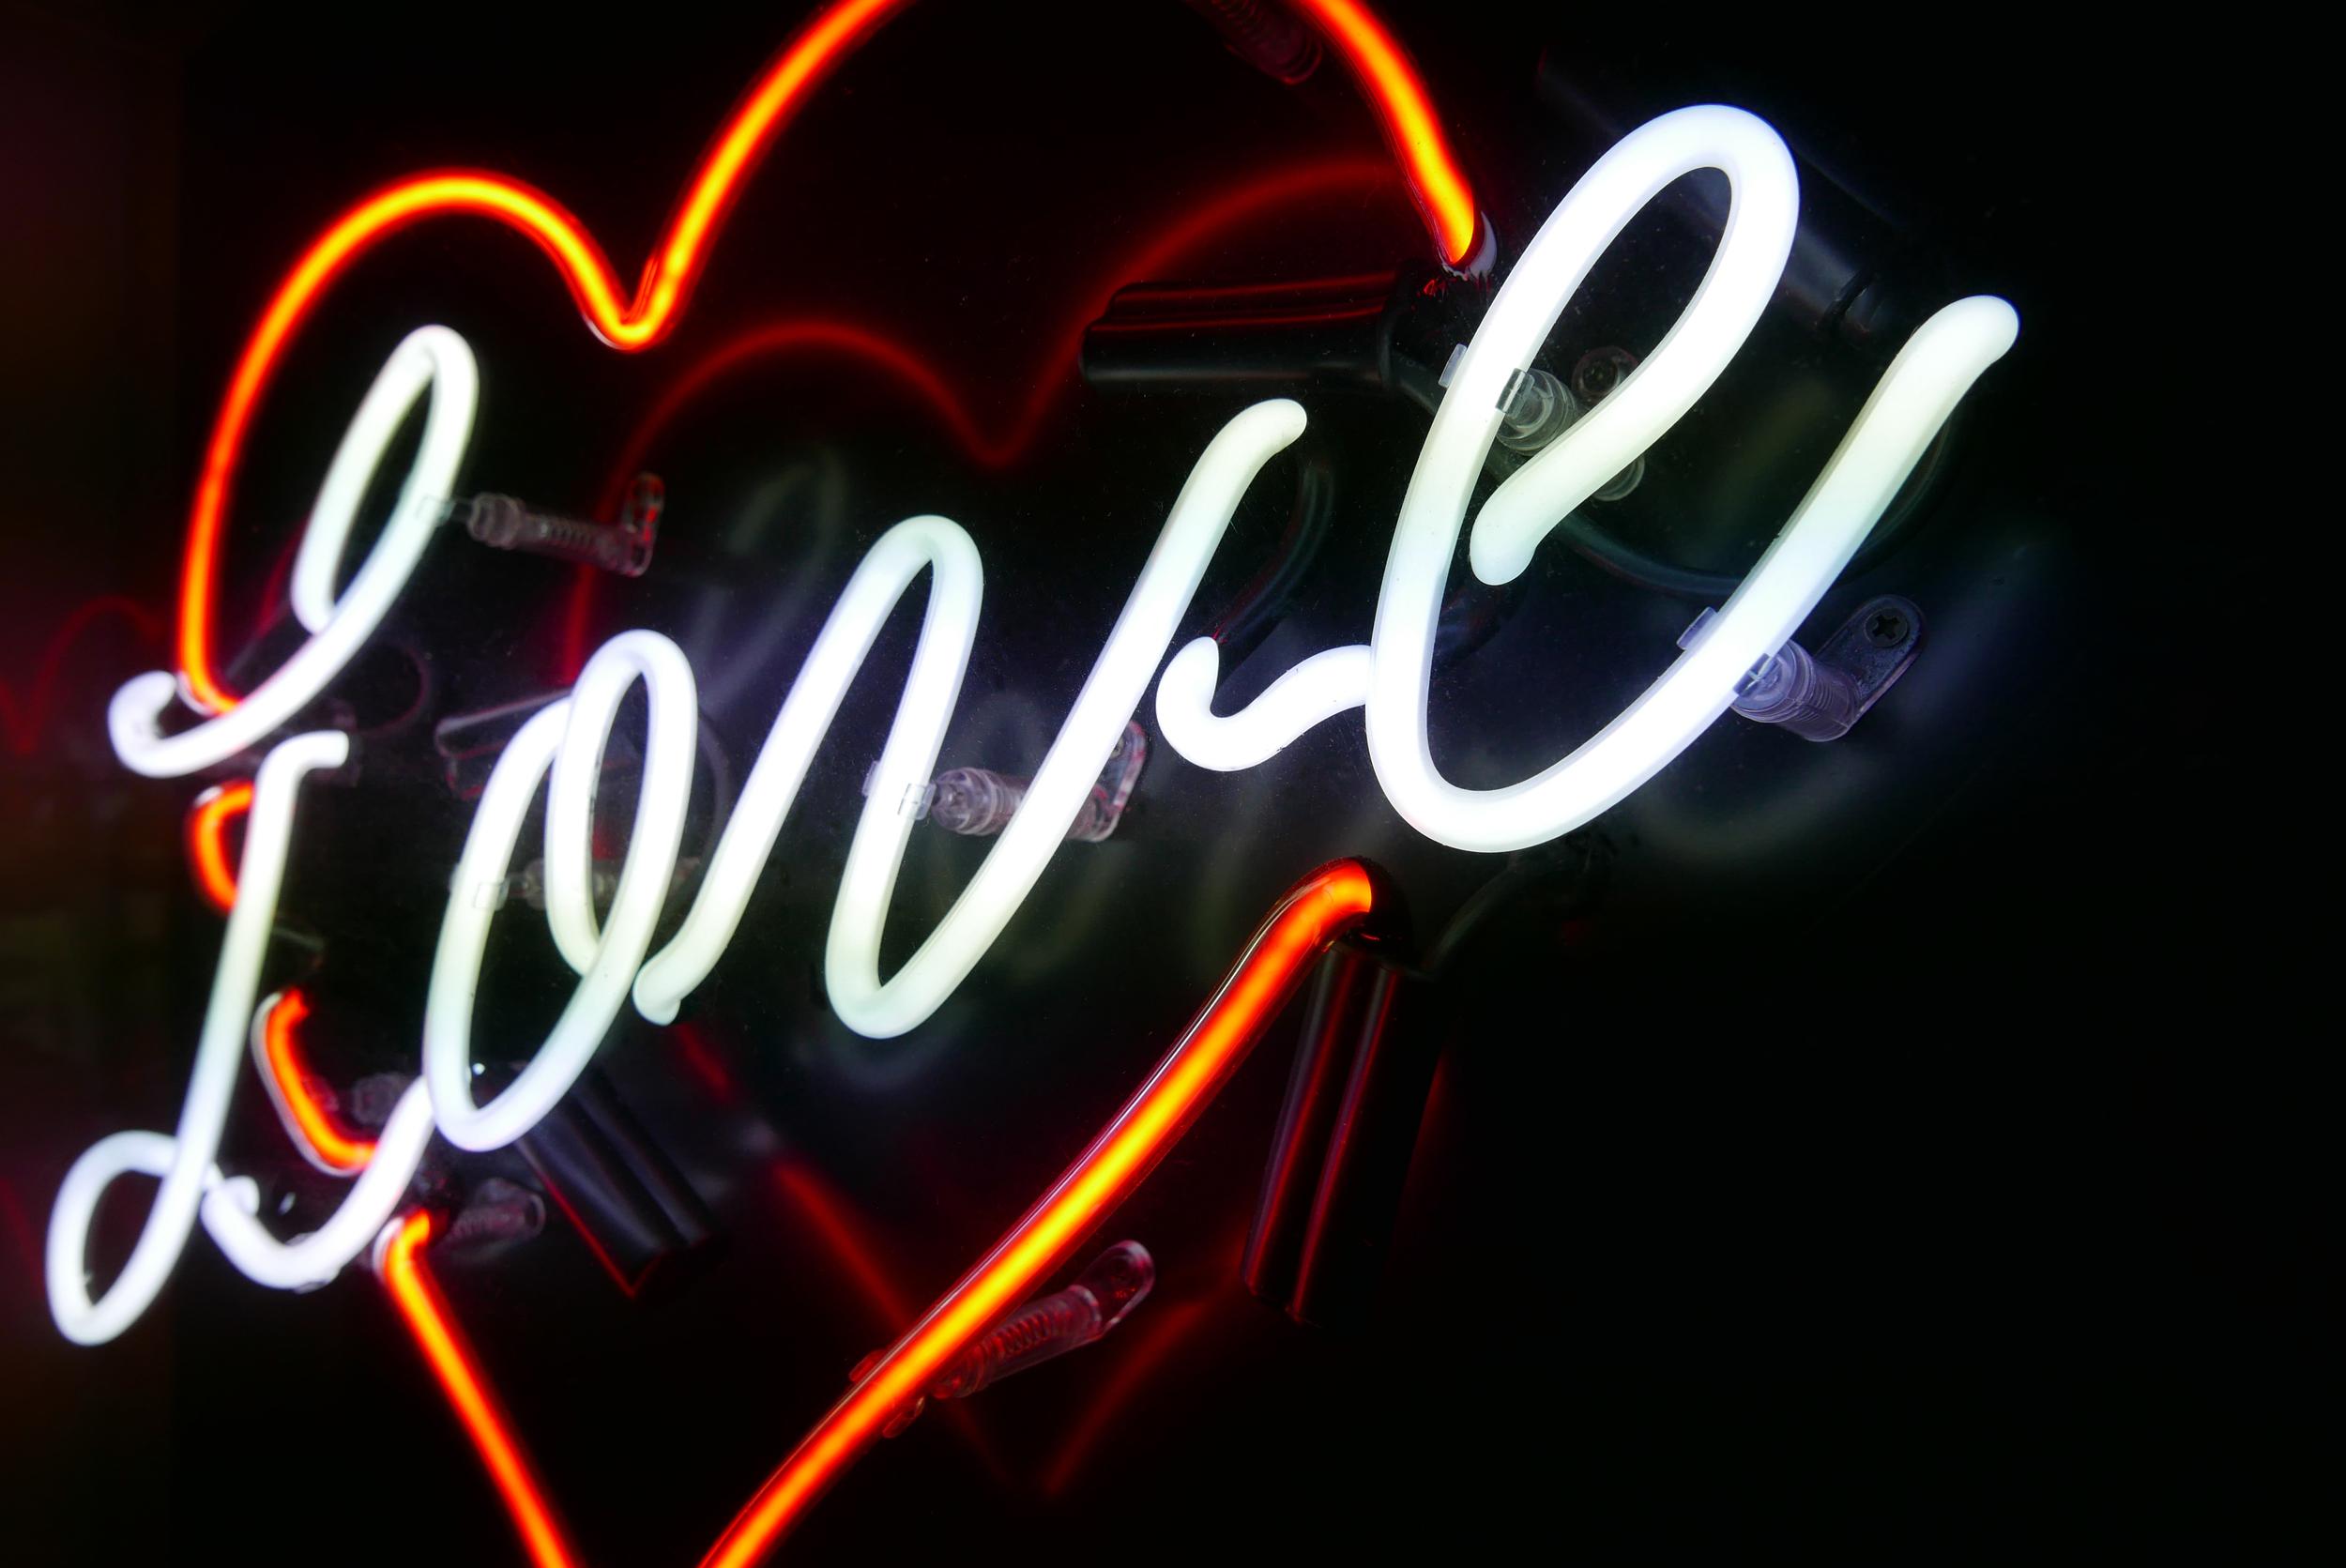 loveheart_angle2.jpg